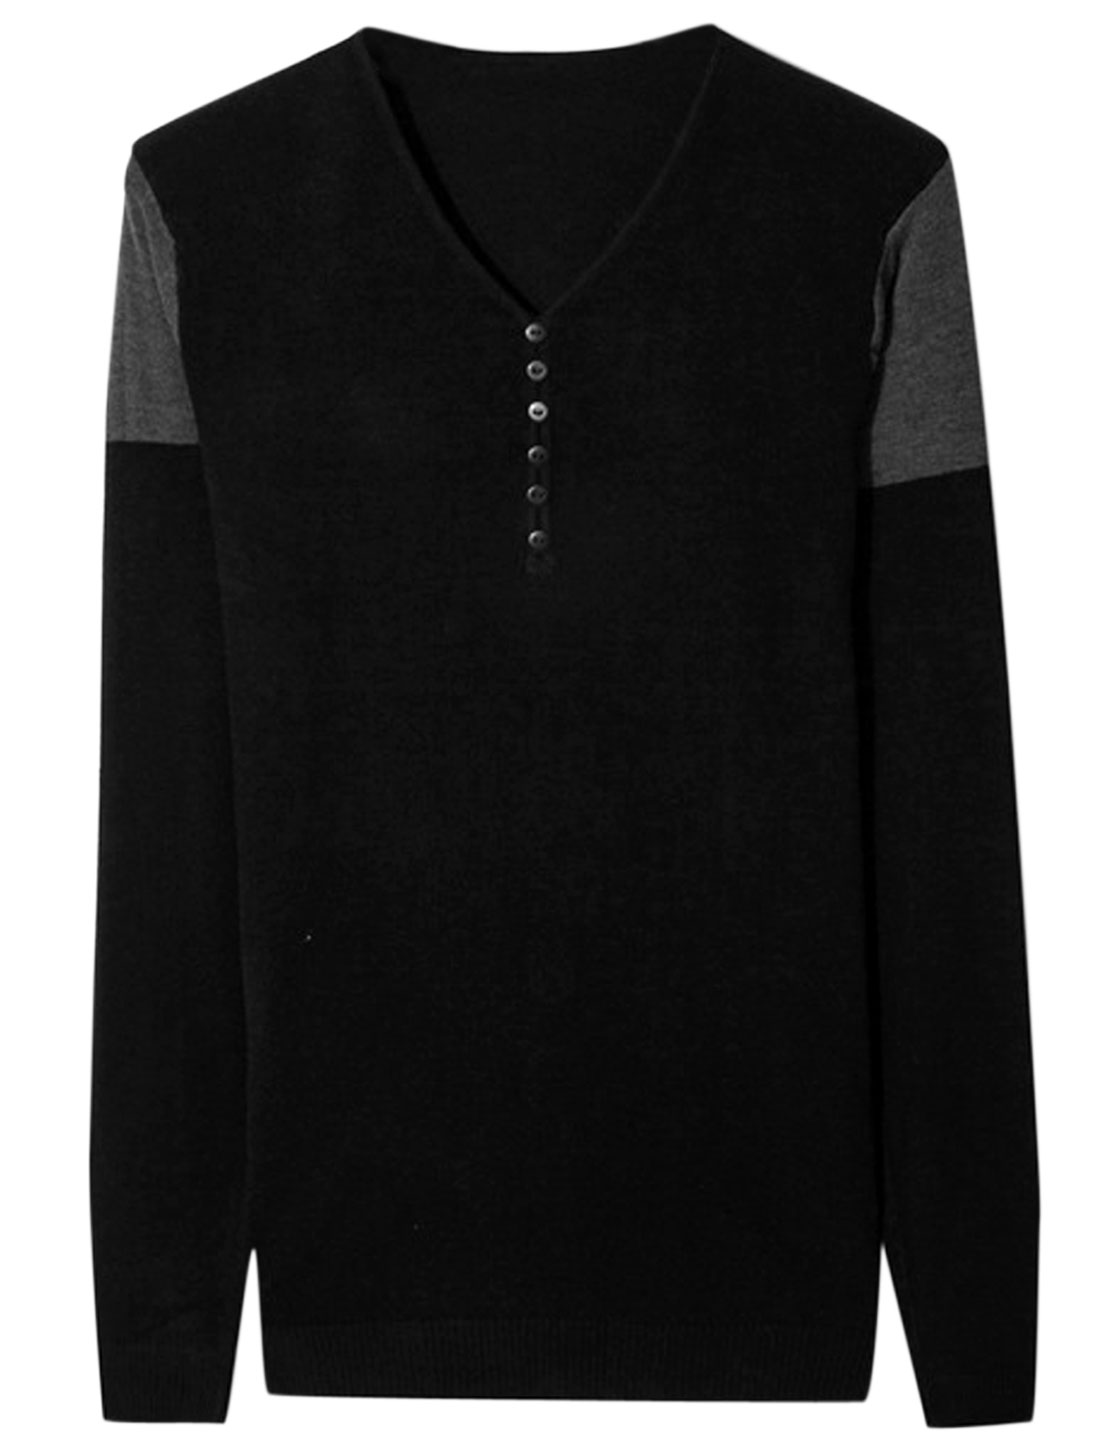 Men V Neck Long Sleeve Buttons Decor Colorblock Knit Shirt Black S